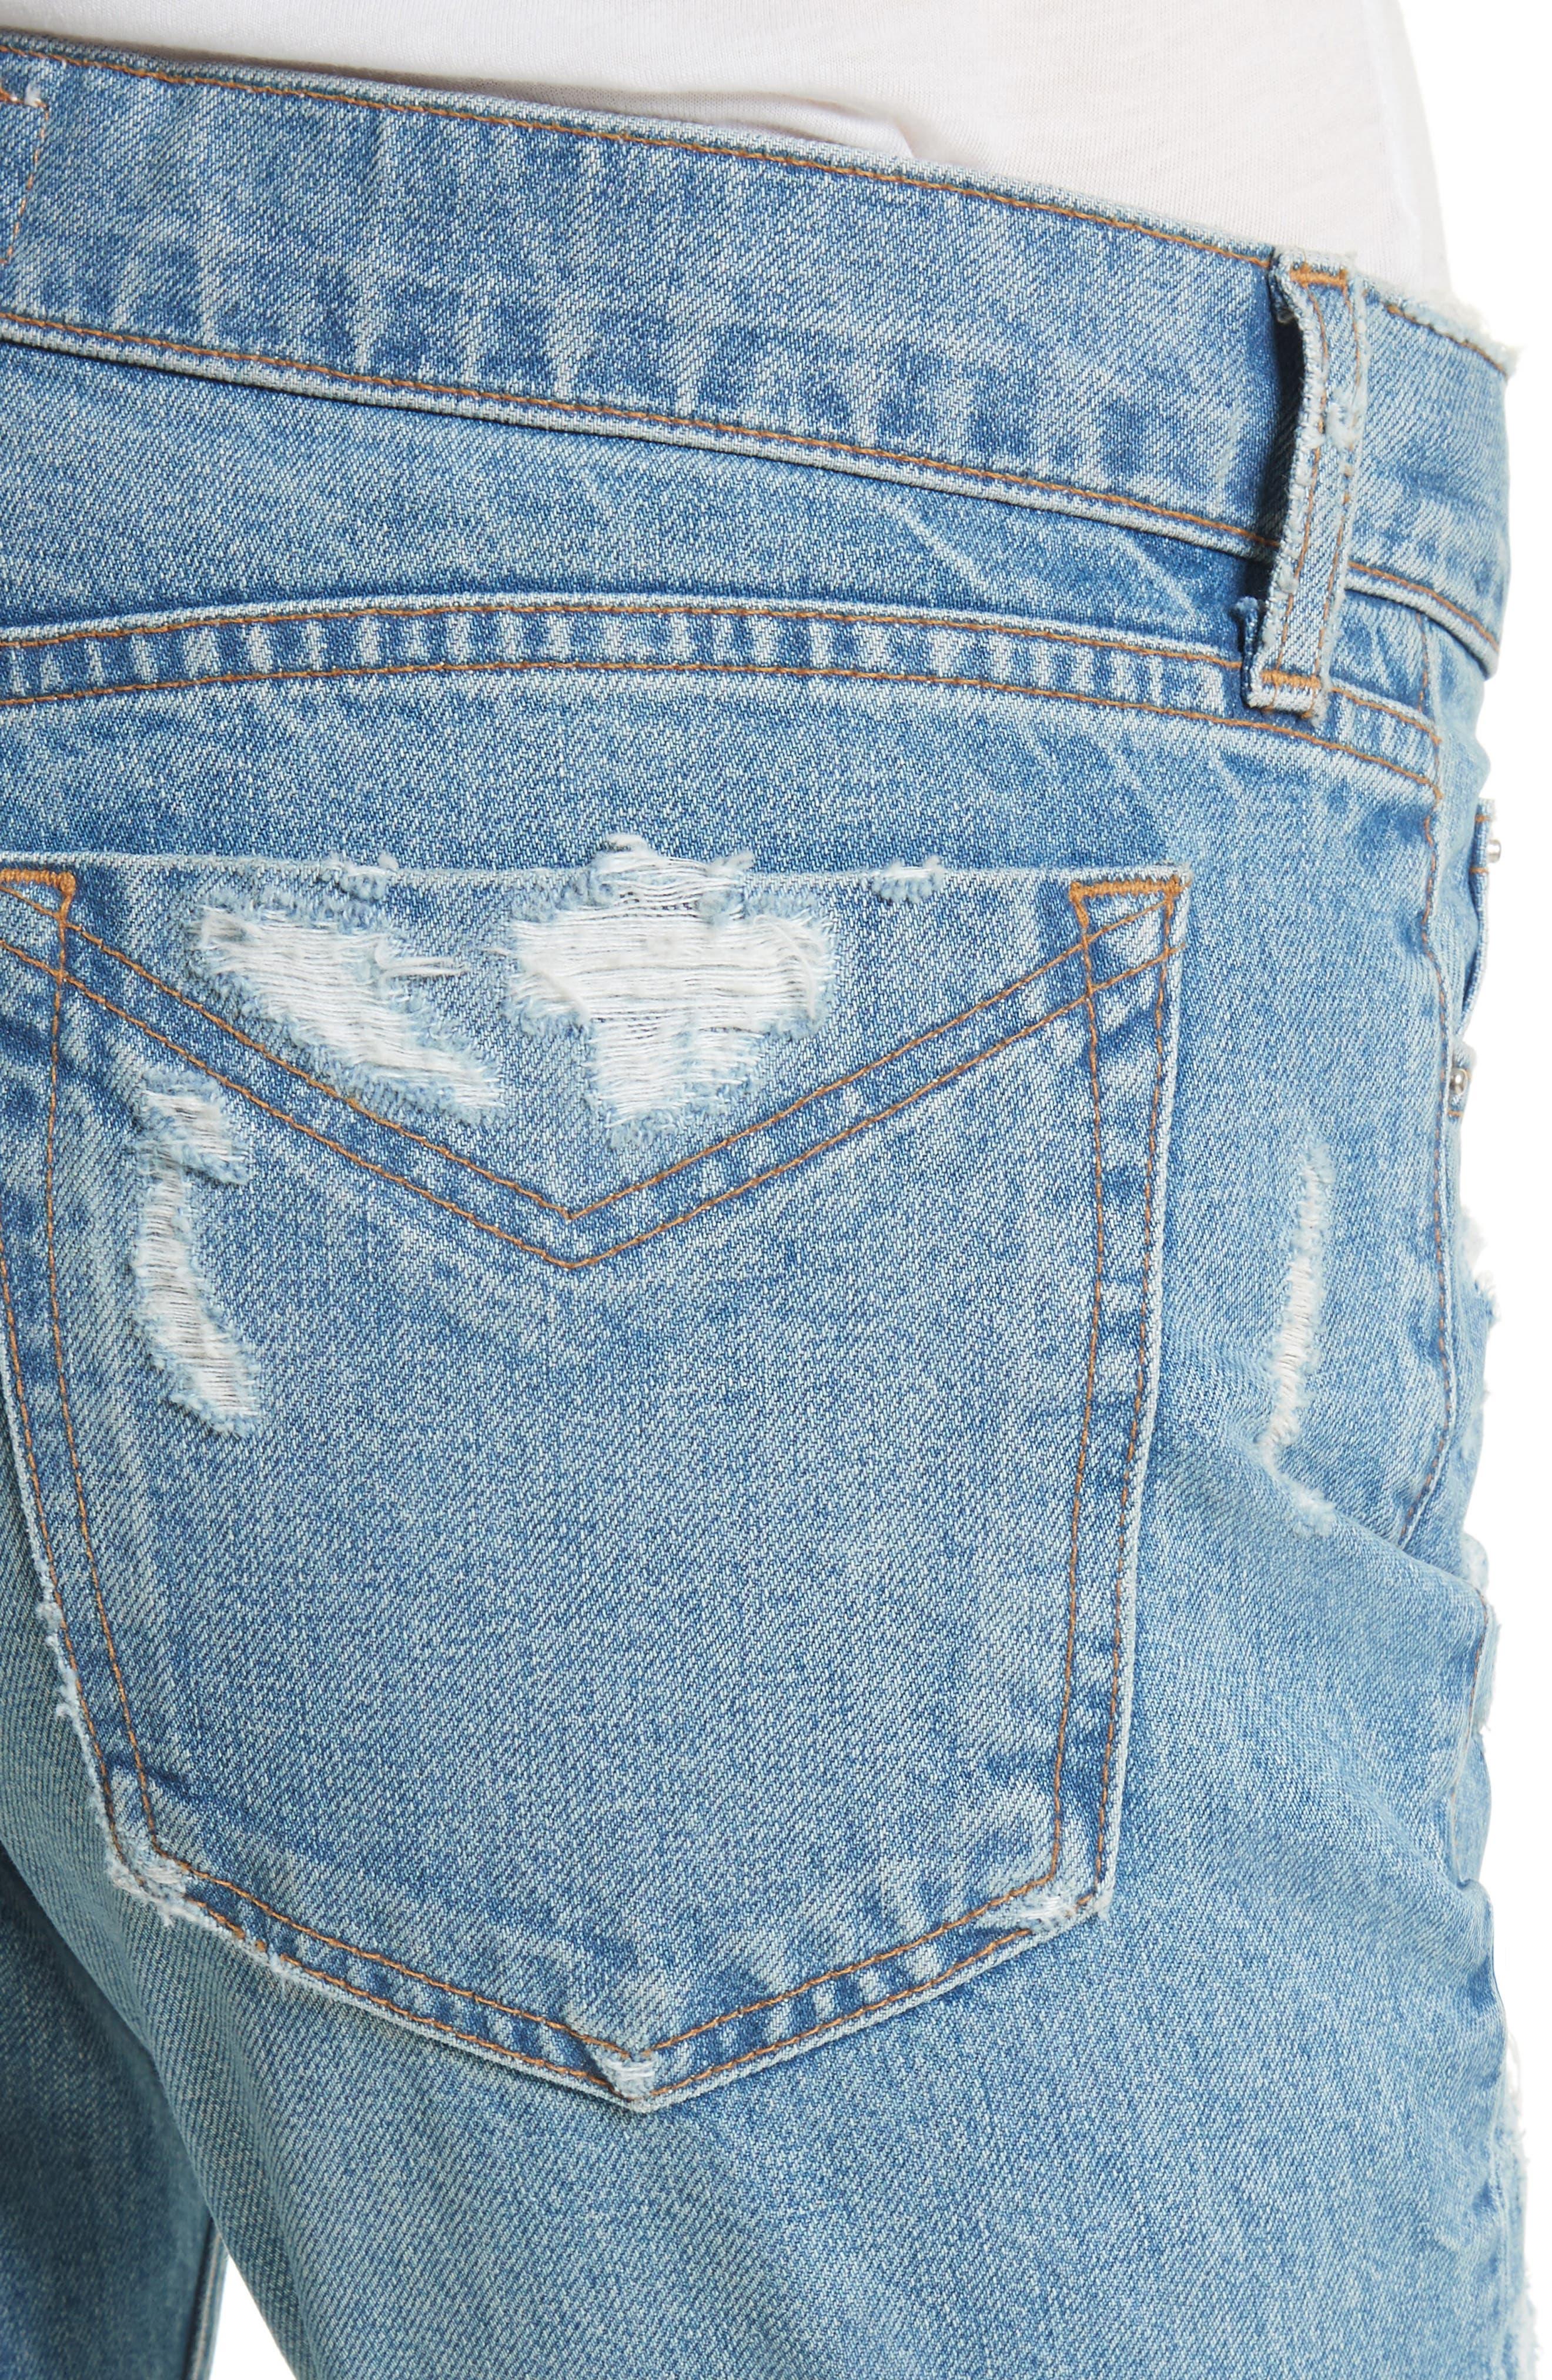 Mila Slim Girlfriend Jeans,                             Alternate thumbnail 4, color,                             450